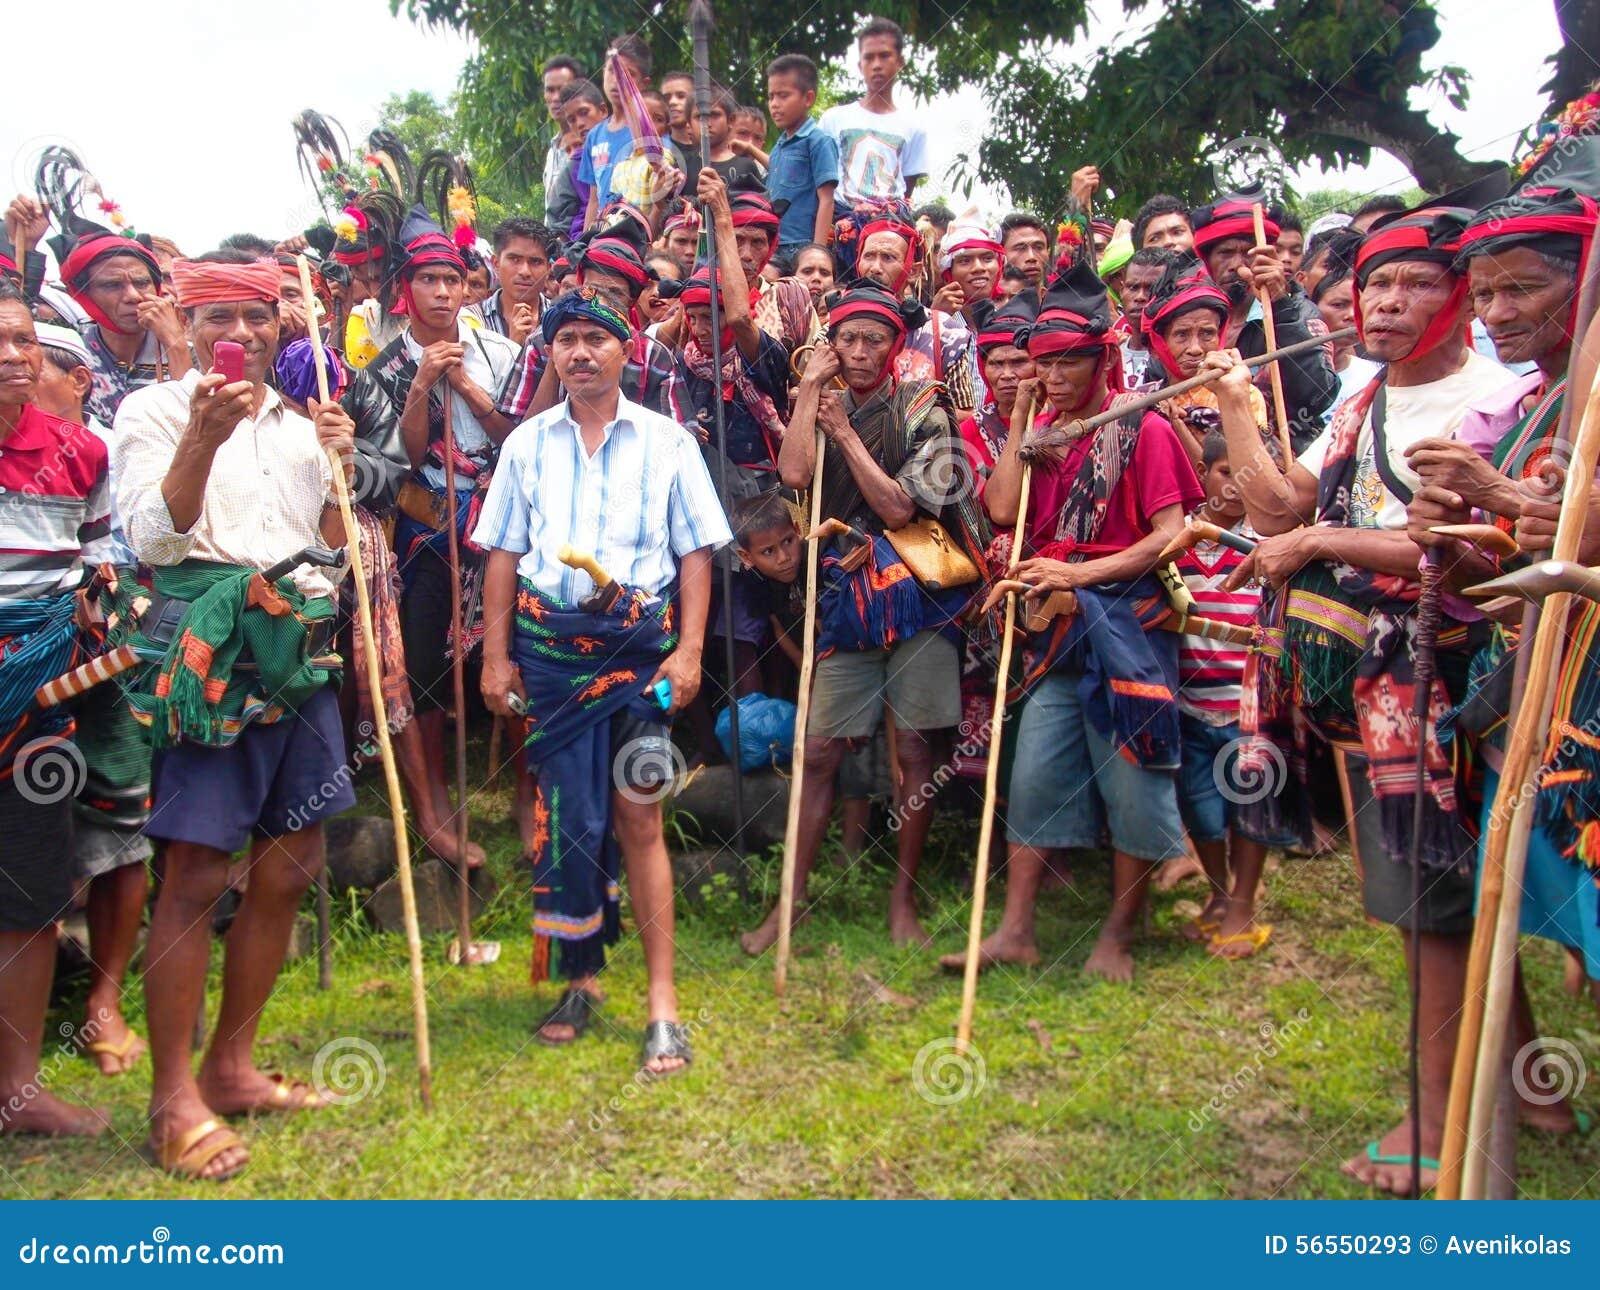 Download Ομάδα ατόμων Sumbanese κατά τη διάρκεια του φεστιβάλ Pasola Εκδοτική Στοκ Εικόνες - εικόνα από άτομο, καπέλο: 56550293